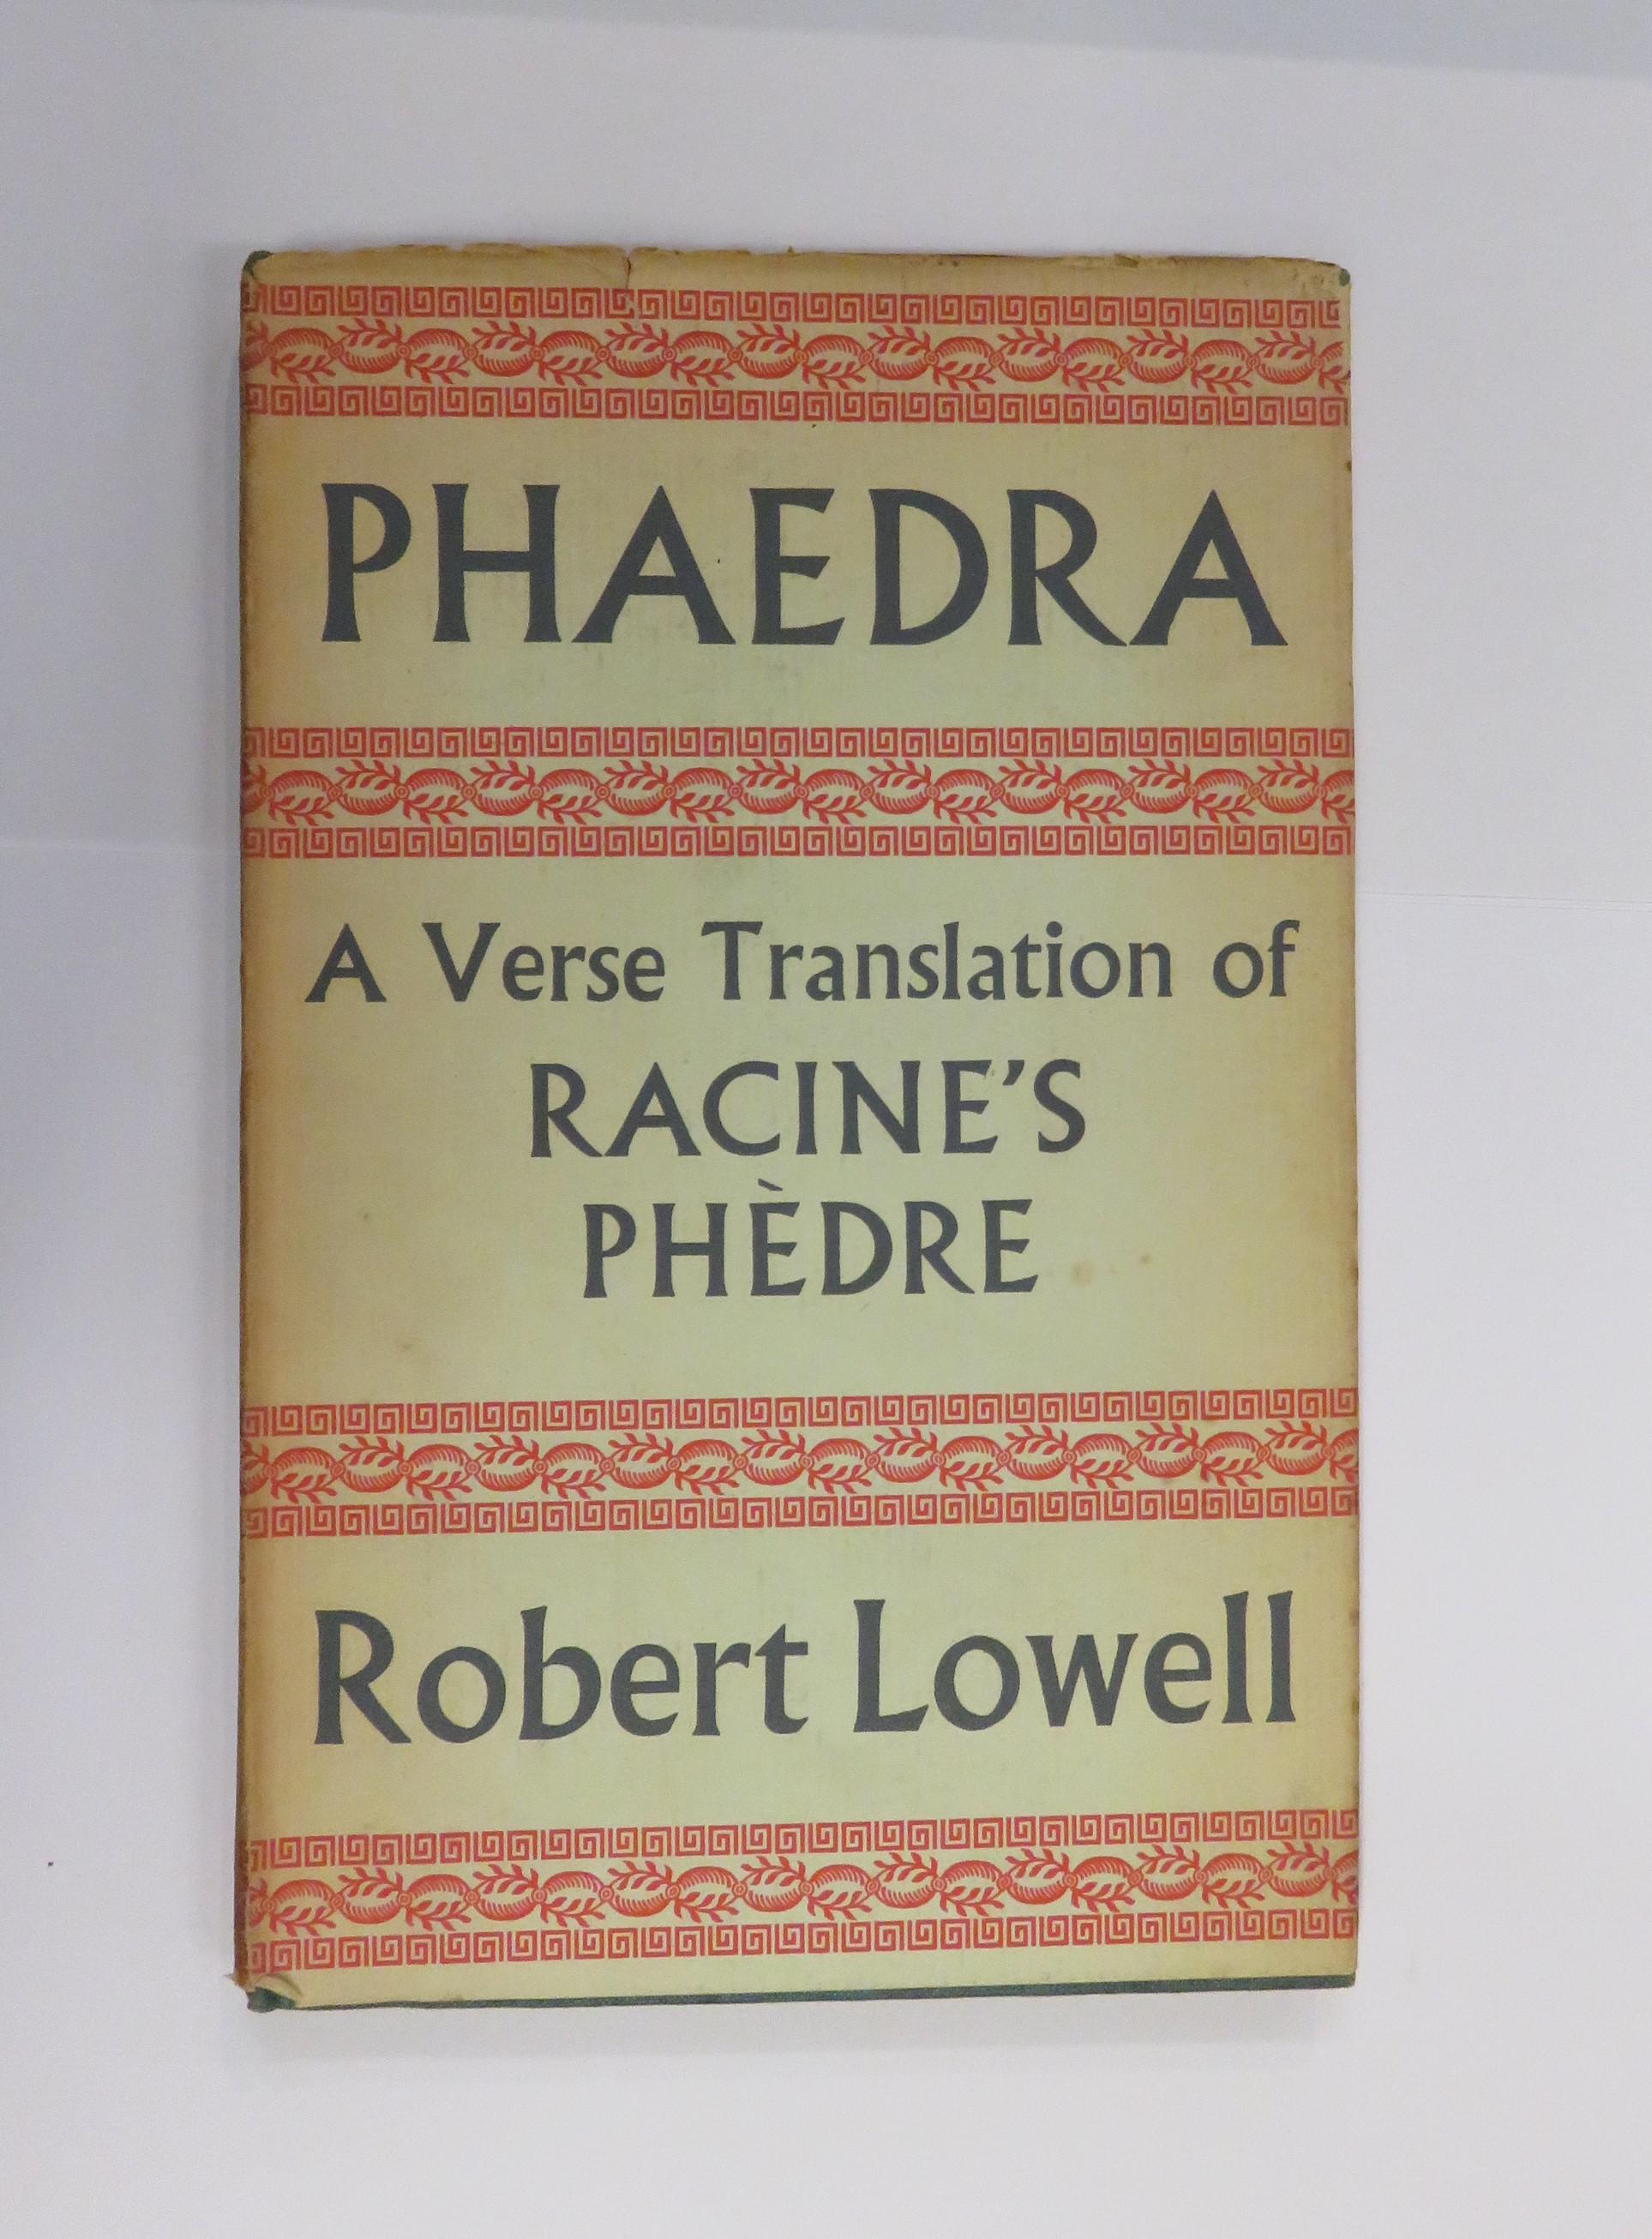 Phaedra: A Verse Translation of Racine's Phedre